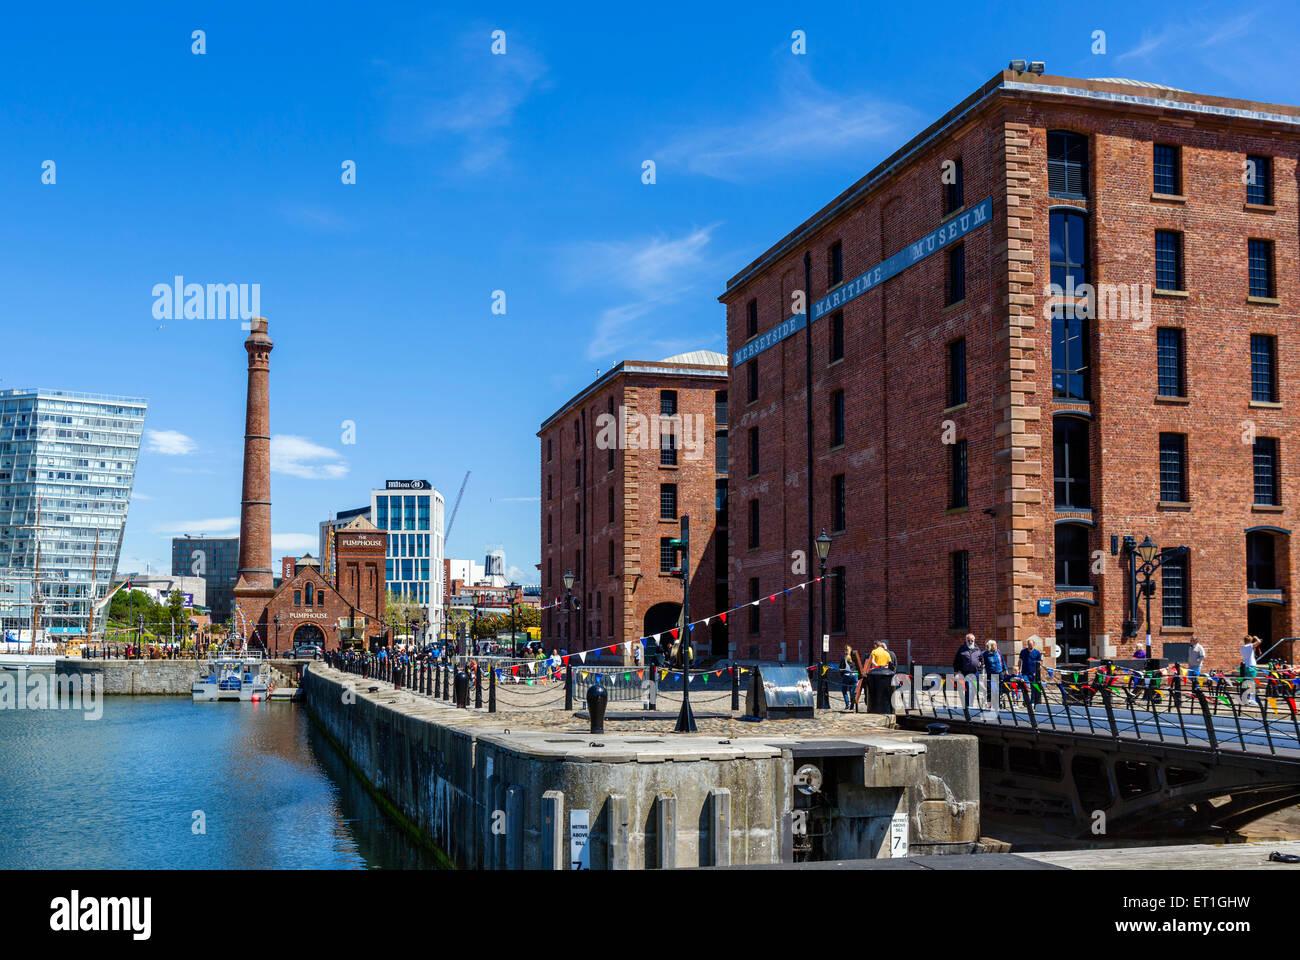 Hartley Quay and the Merseyside Maritime Museum, Albert Dock, Liverpool, Merseyside, England, UK - Stock Image